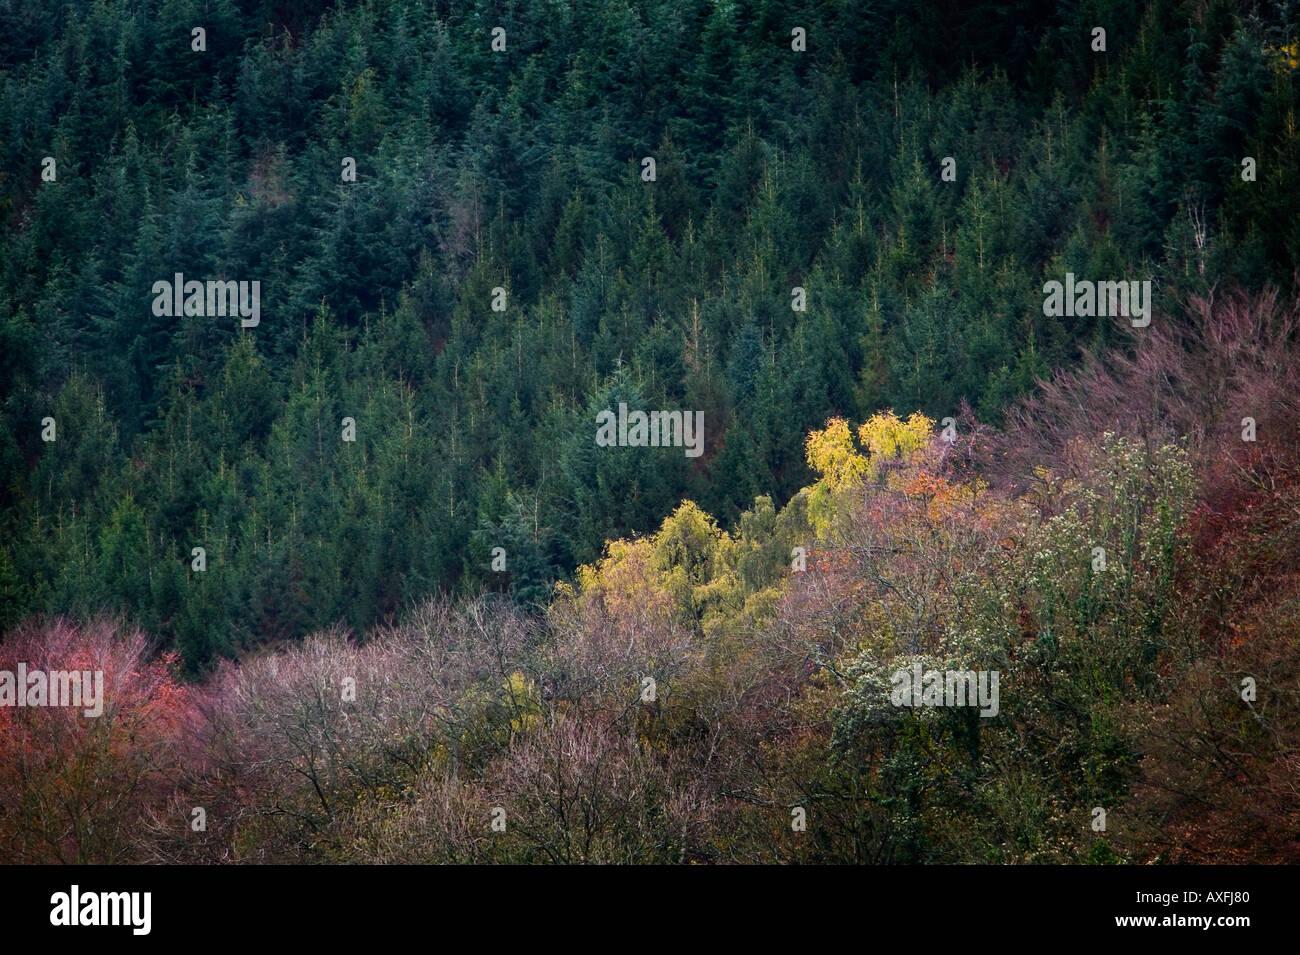 Forest in autumn Blorenge Llanfoist Wales UK - Stock Image